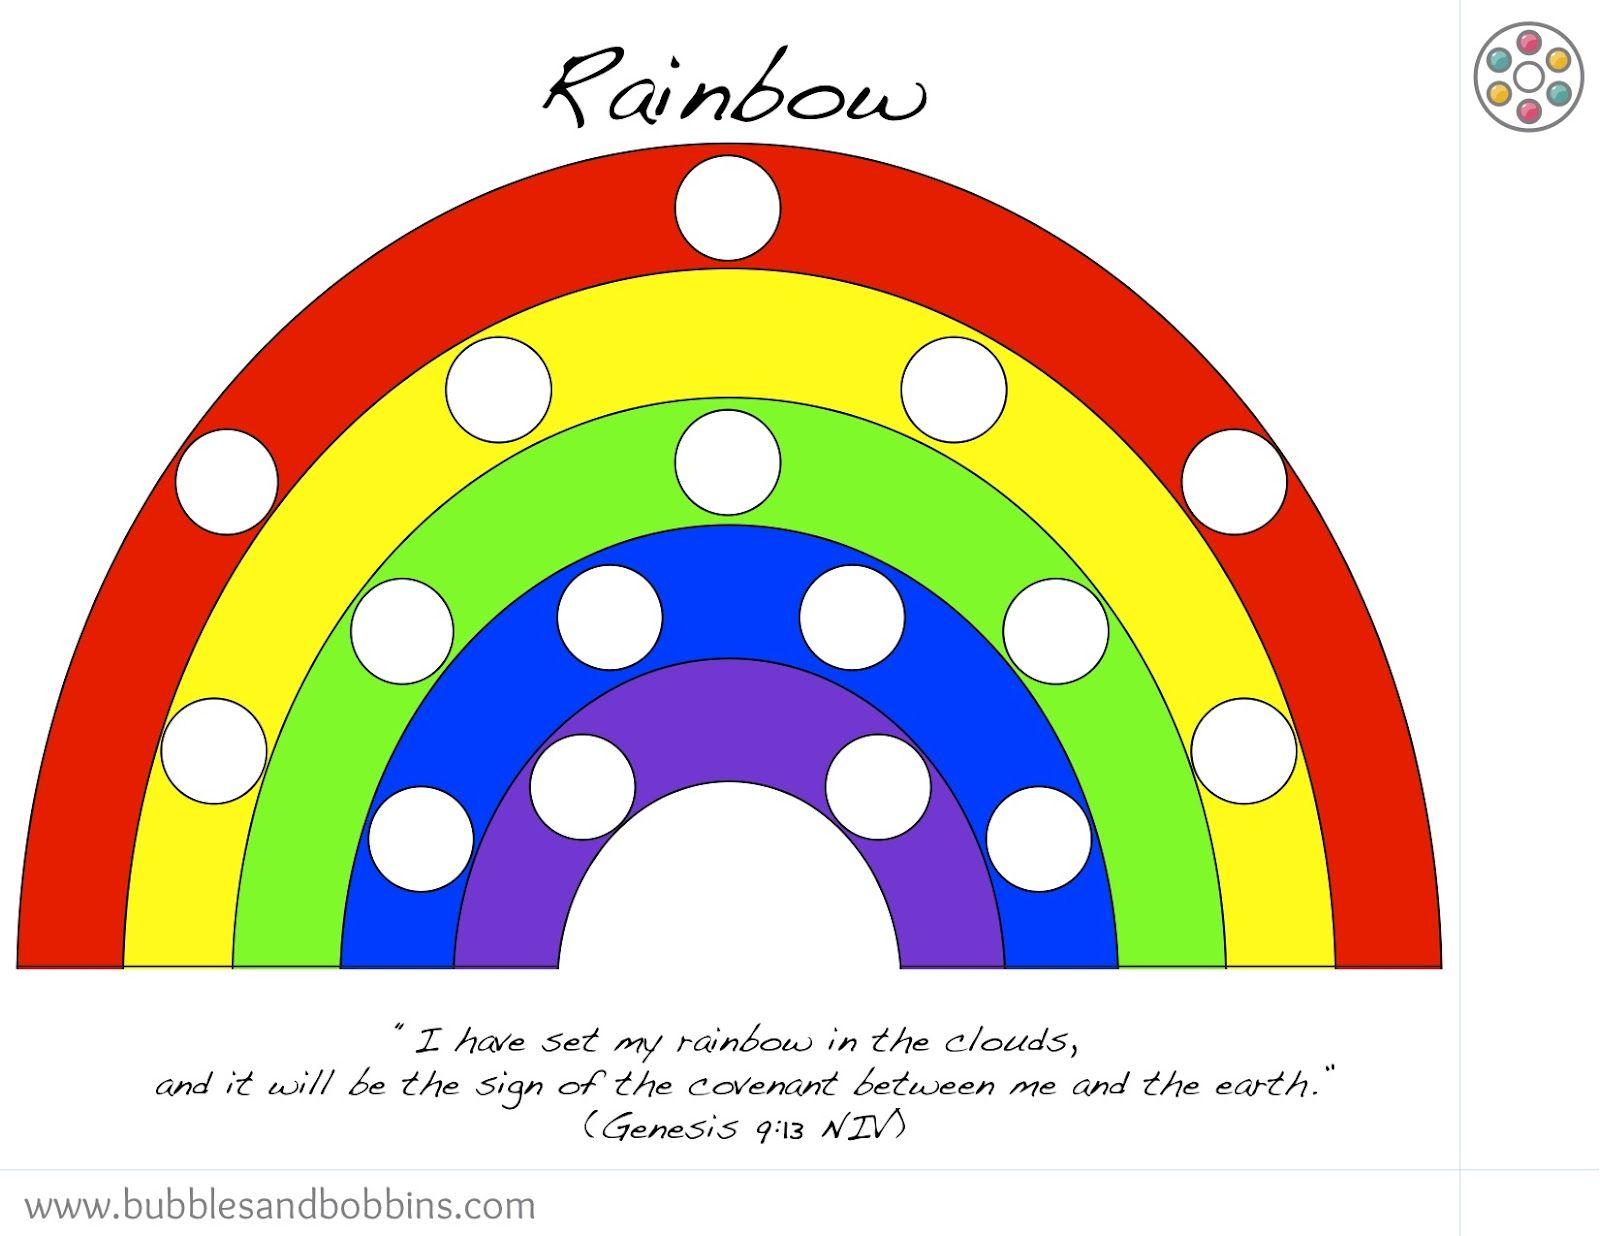 Rainbow Magnetic Pompom Template 1 600 1 236 Pixels